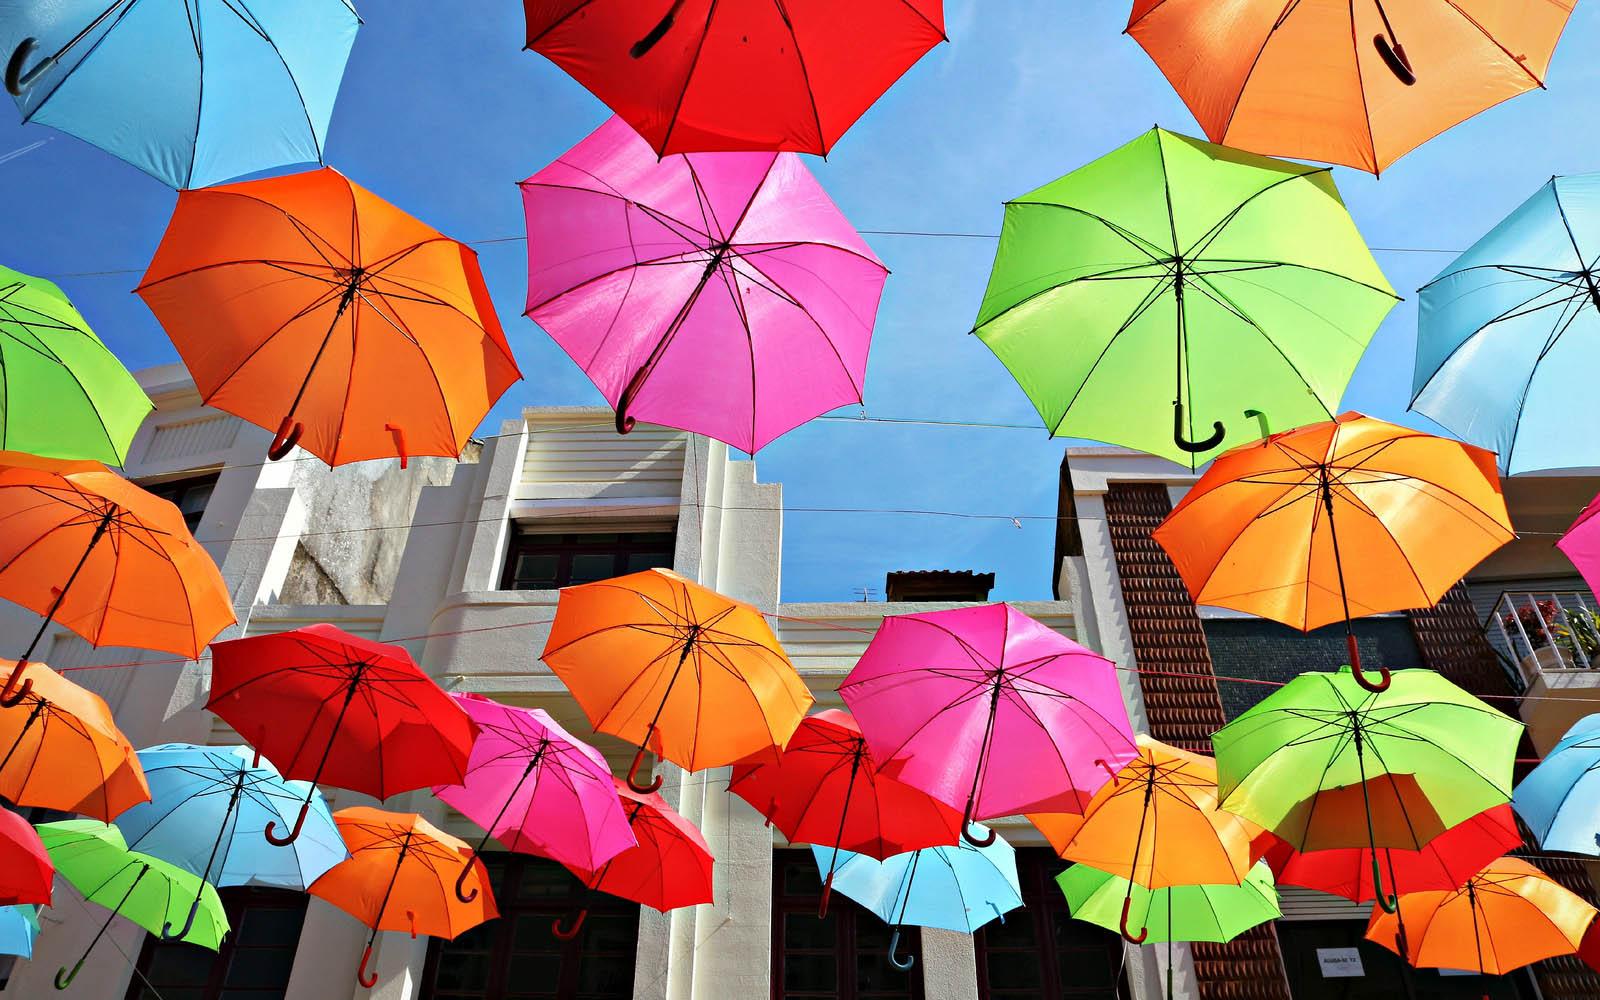 Wallpapers Colorful Umbrellas